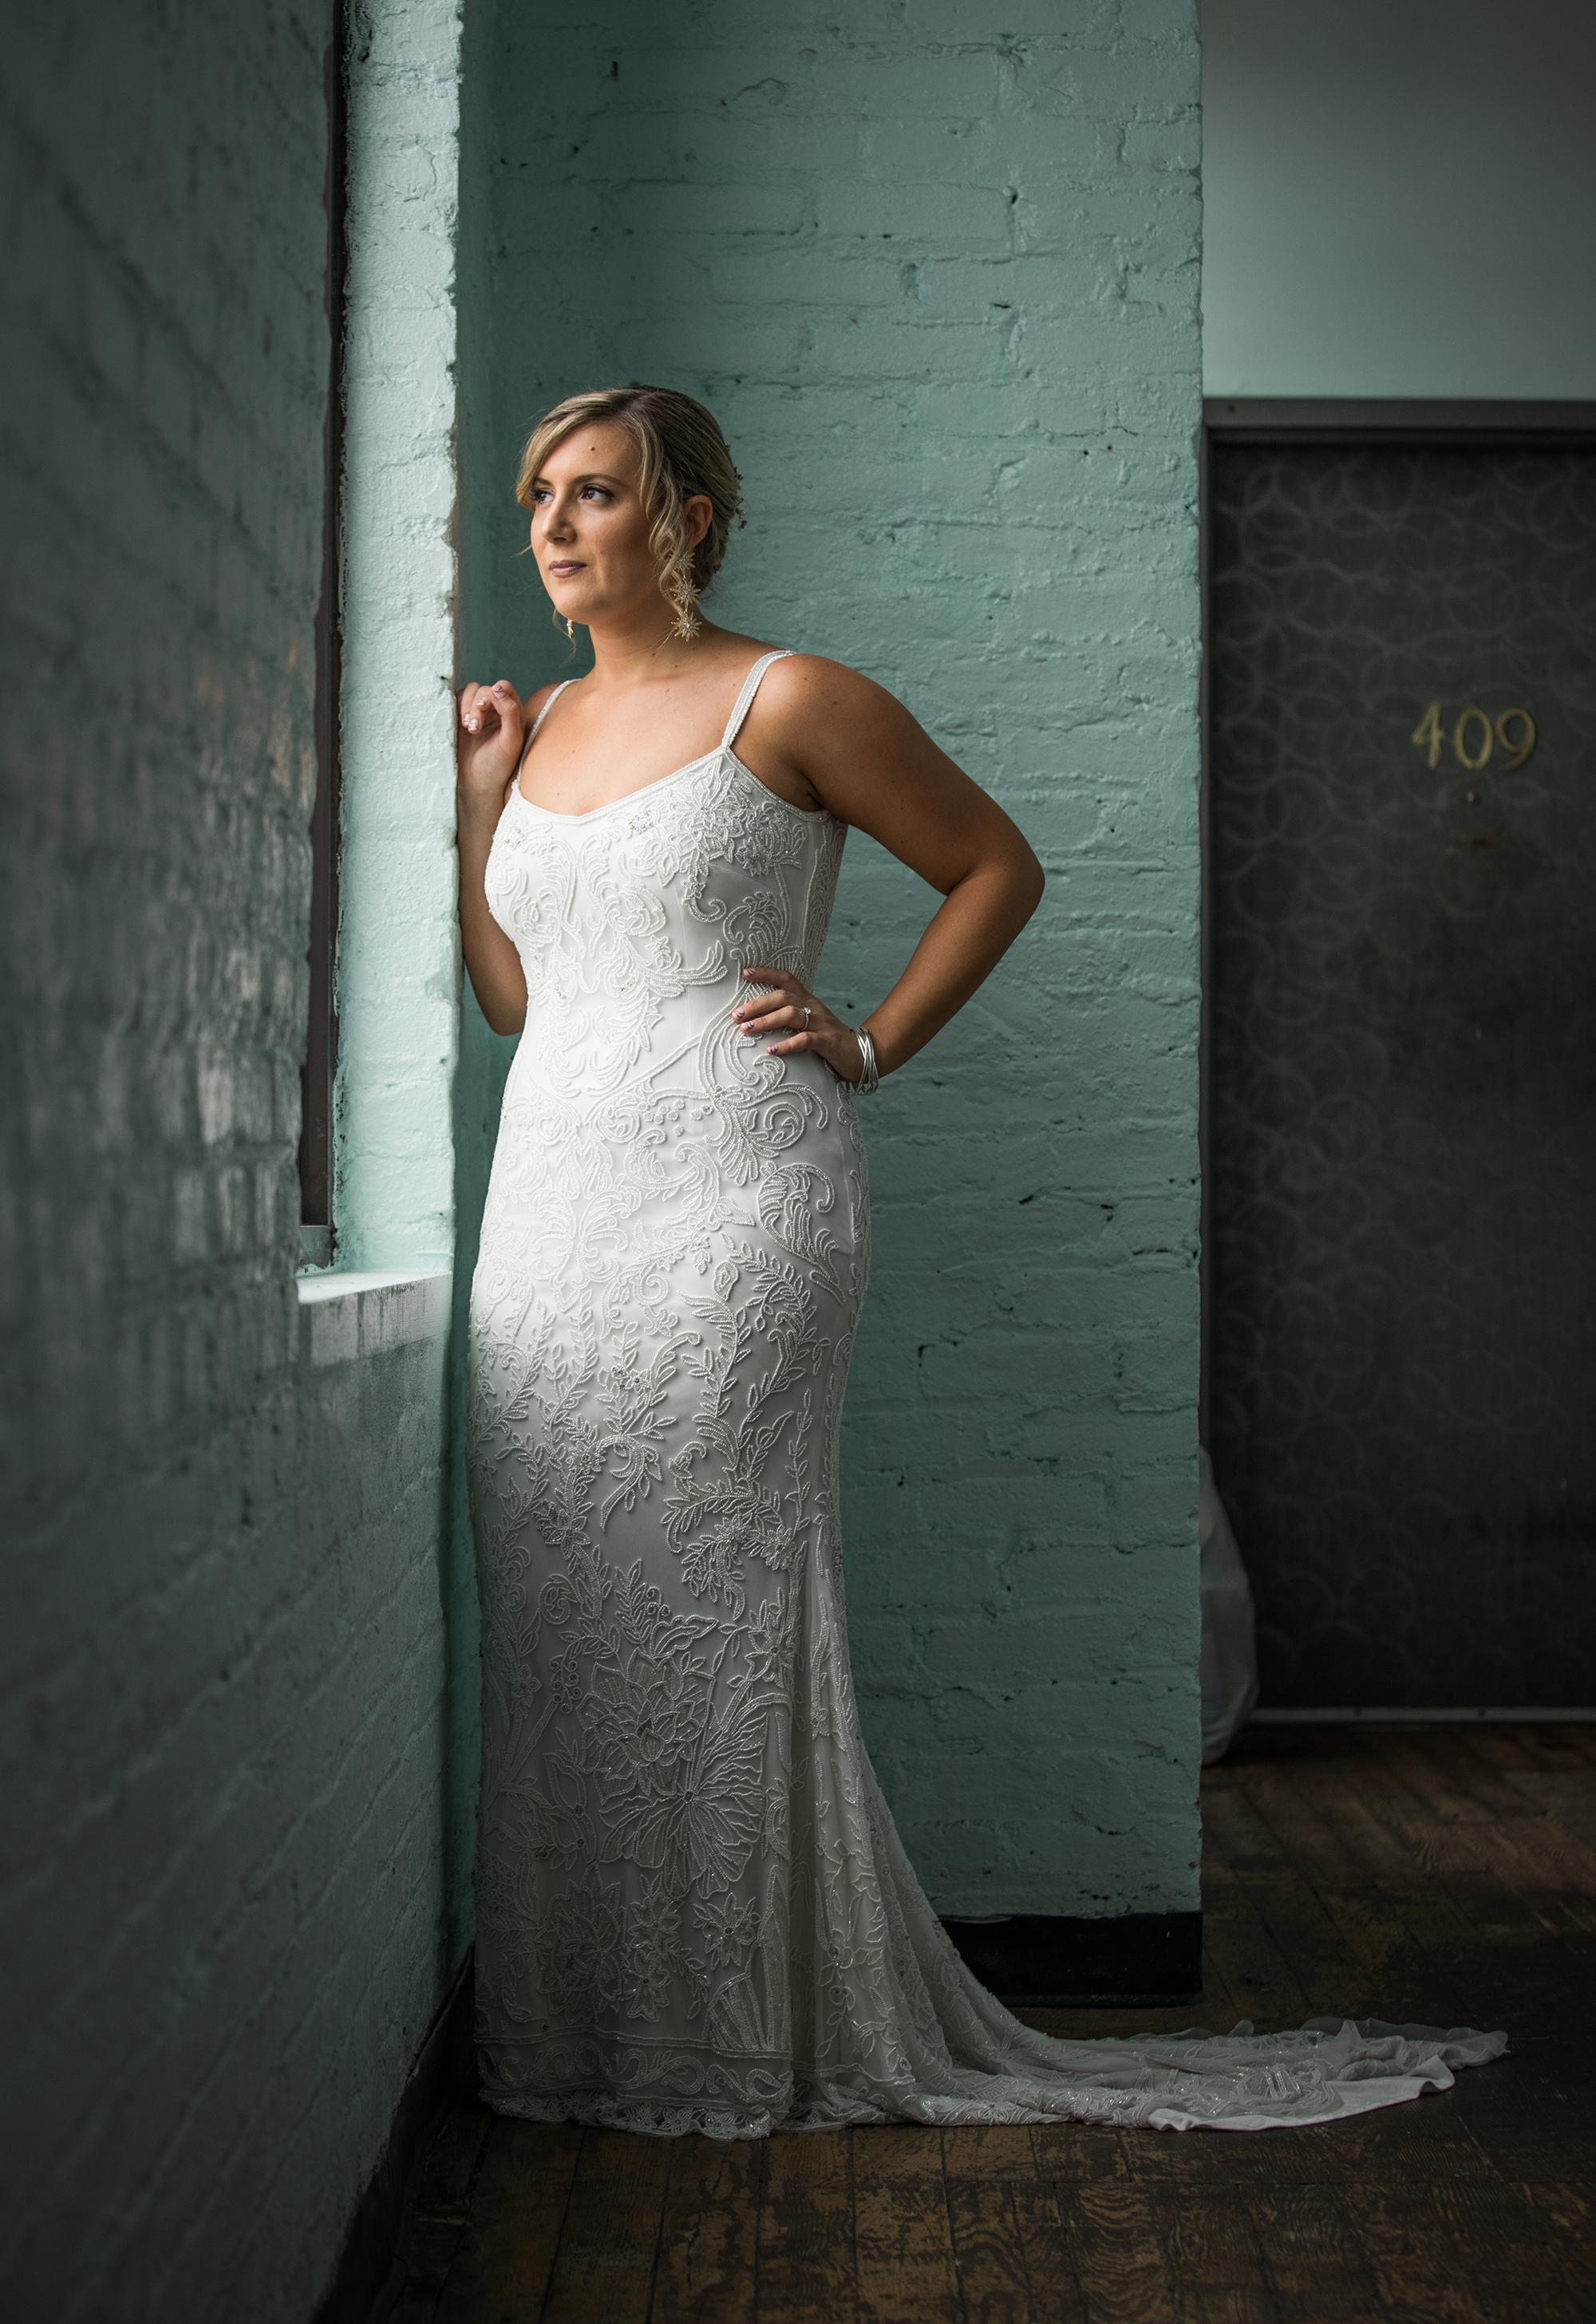 Julep-Belle-Wedding-Photography-Los-Angeles-Grace-Jake-13.jpg